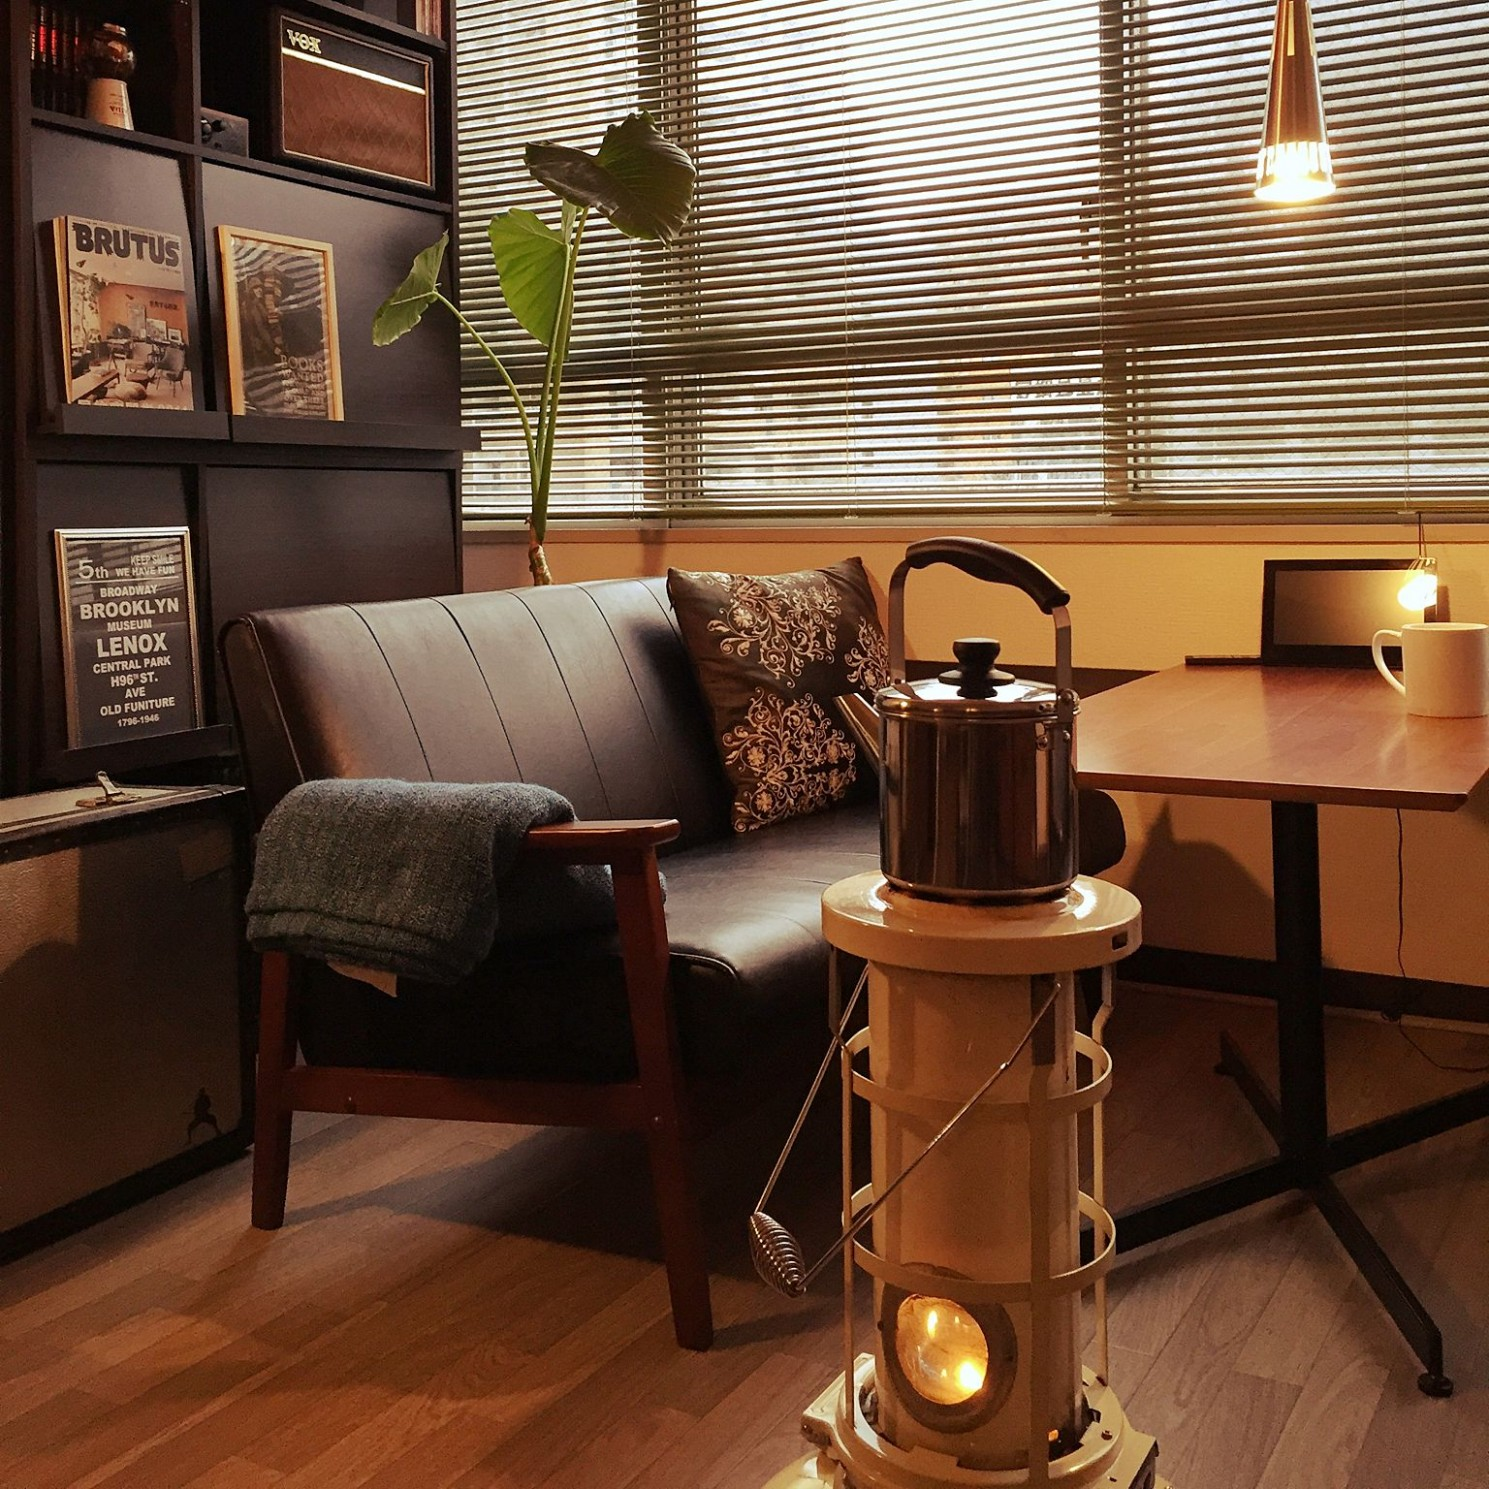 Studio apartment decorating ideas stylish home office japan - Blog - Japanese Home Office Ideas